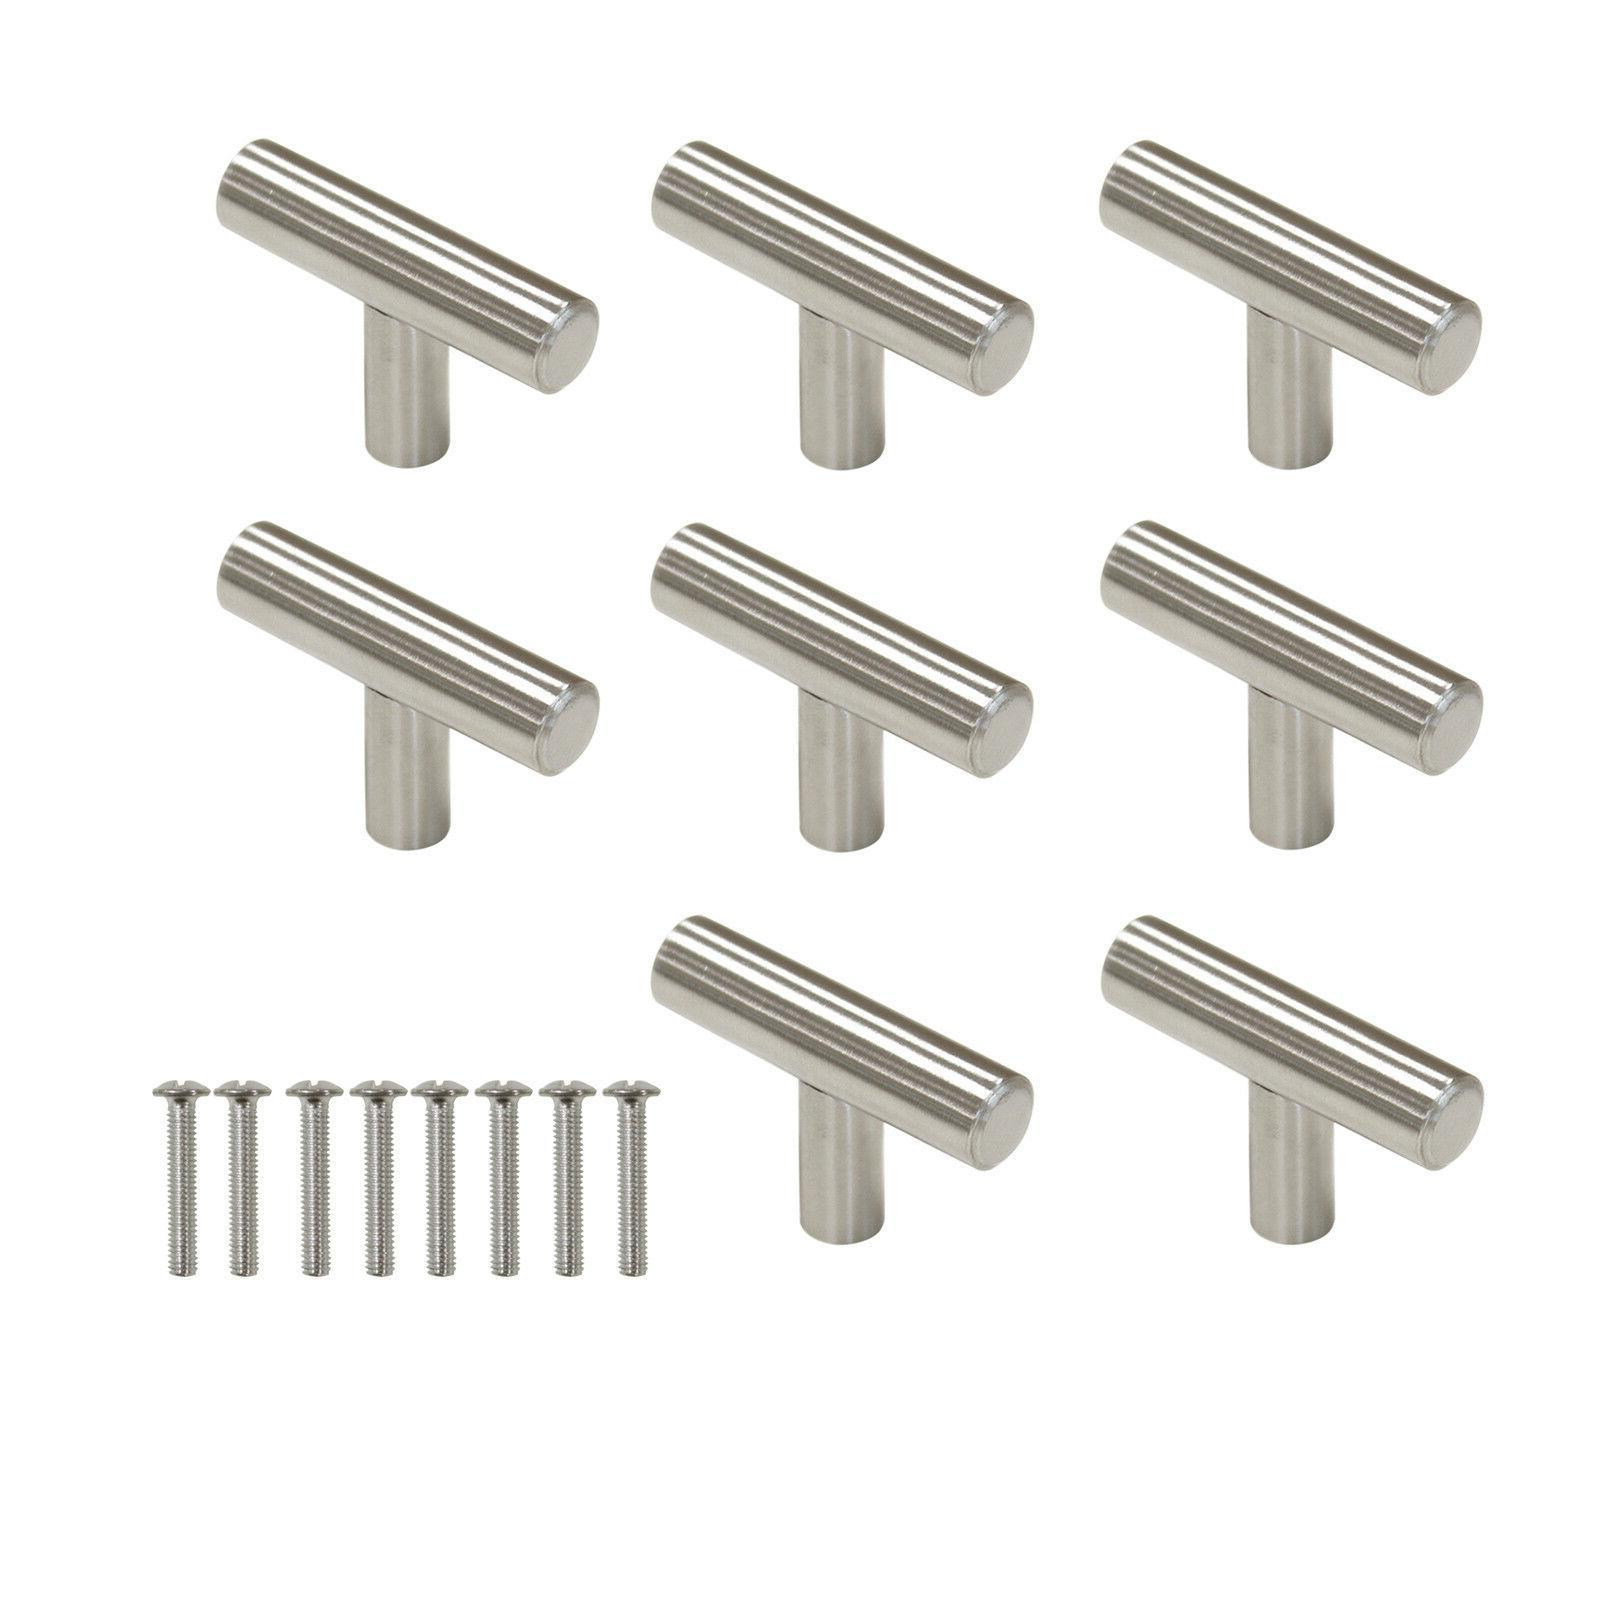 30Pack Pulls Steel Drawer T Bar Handles